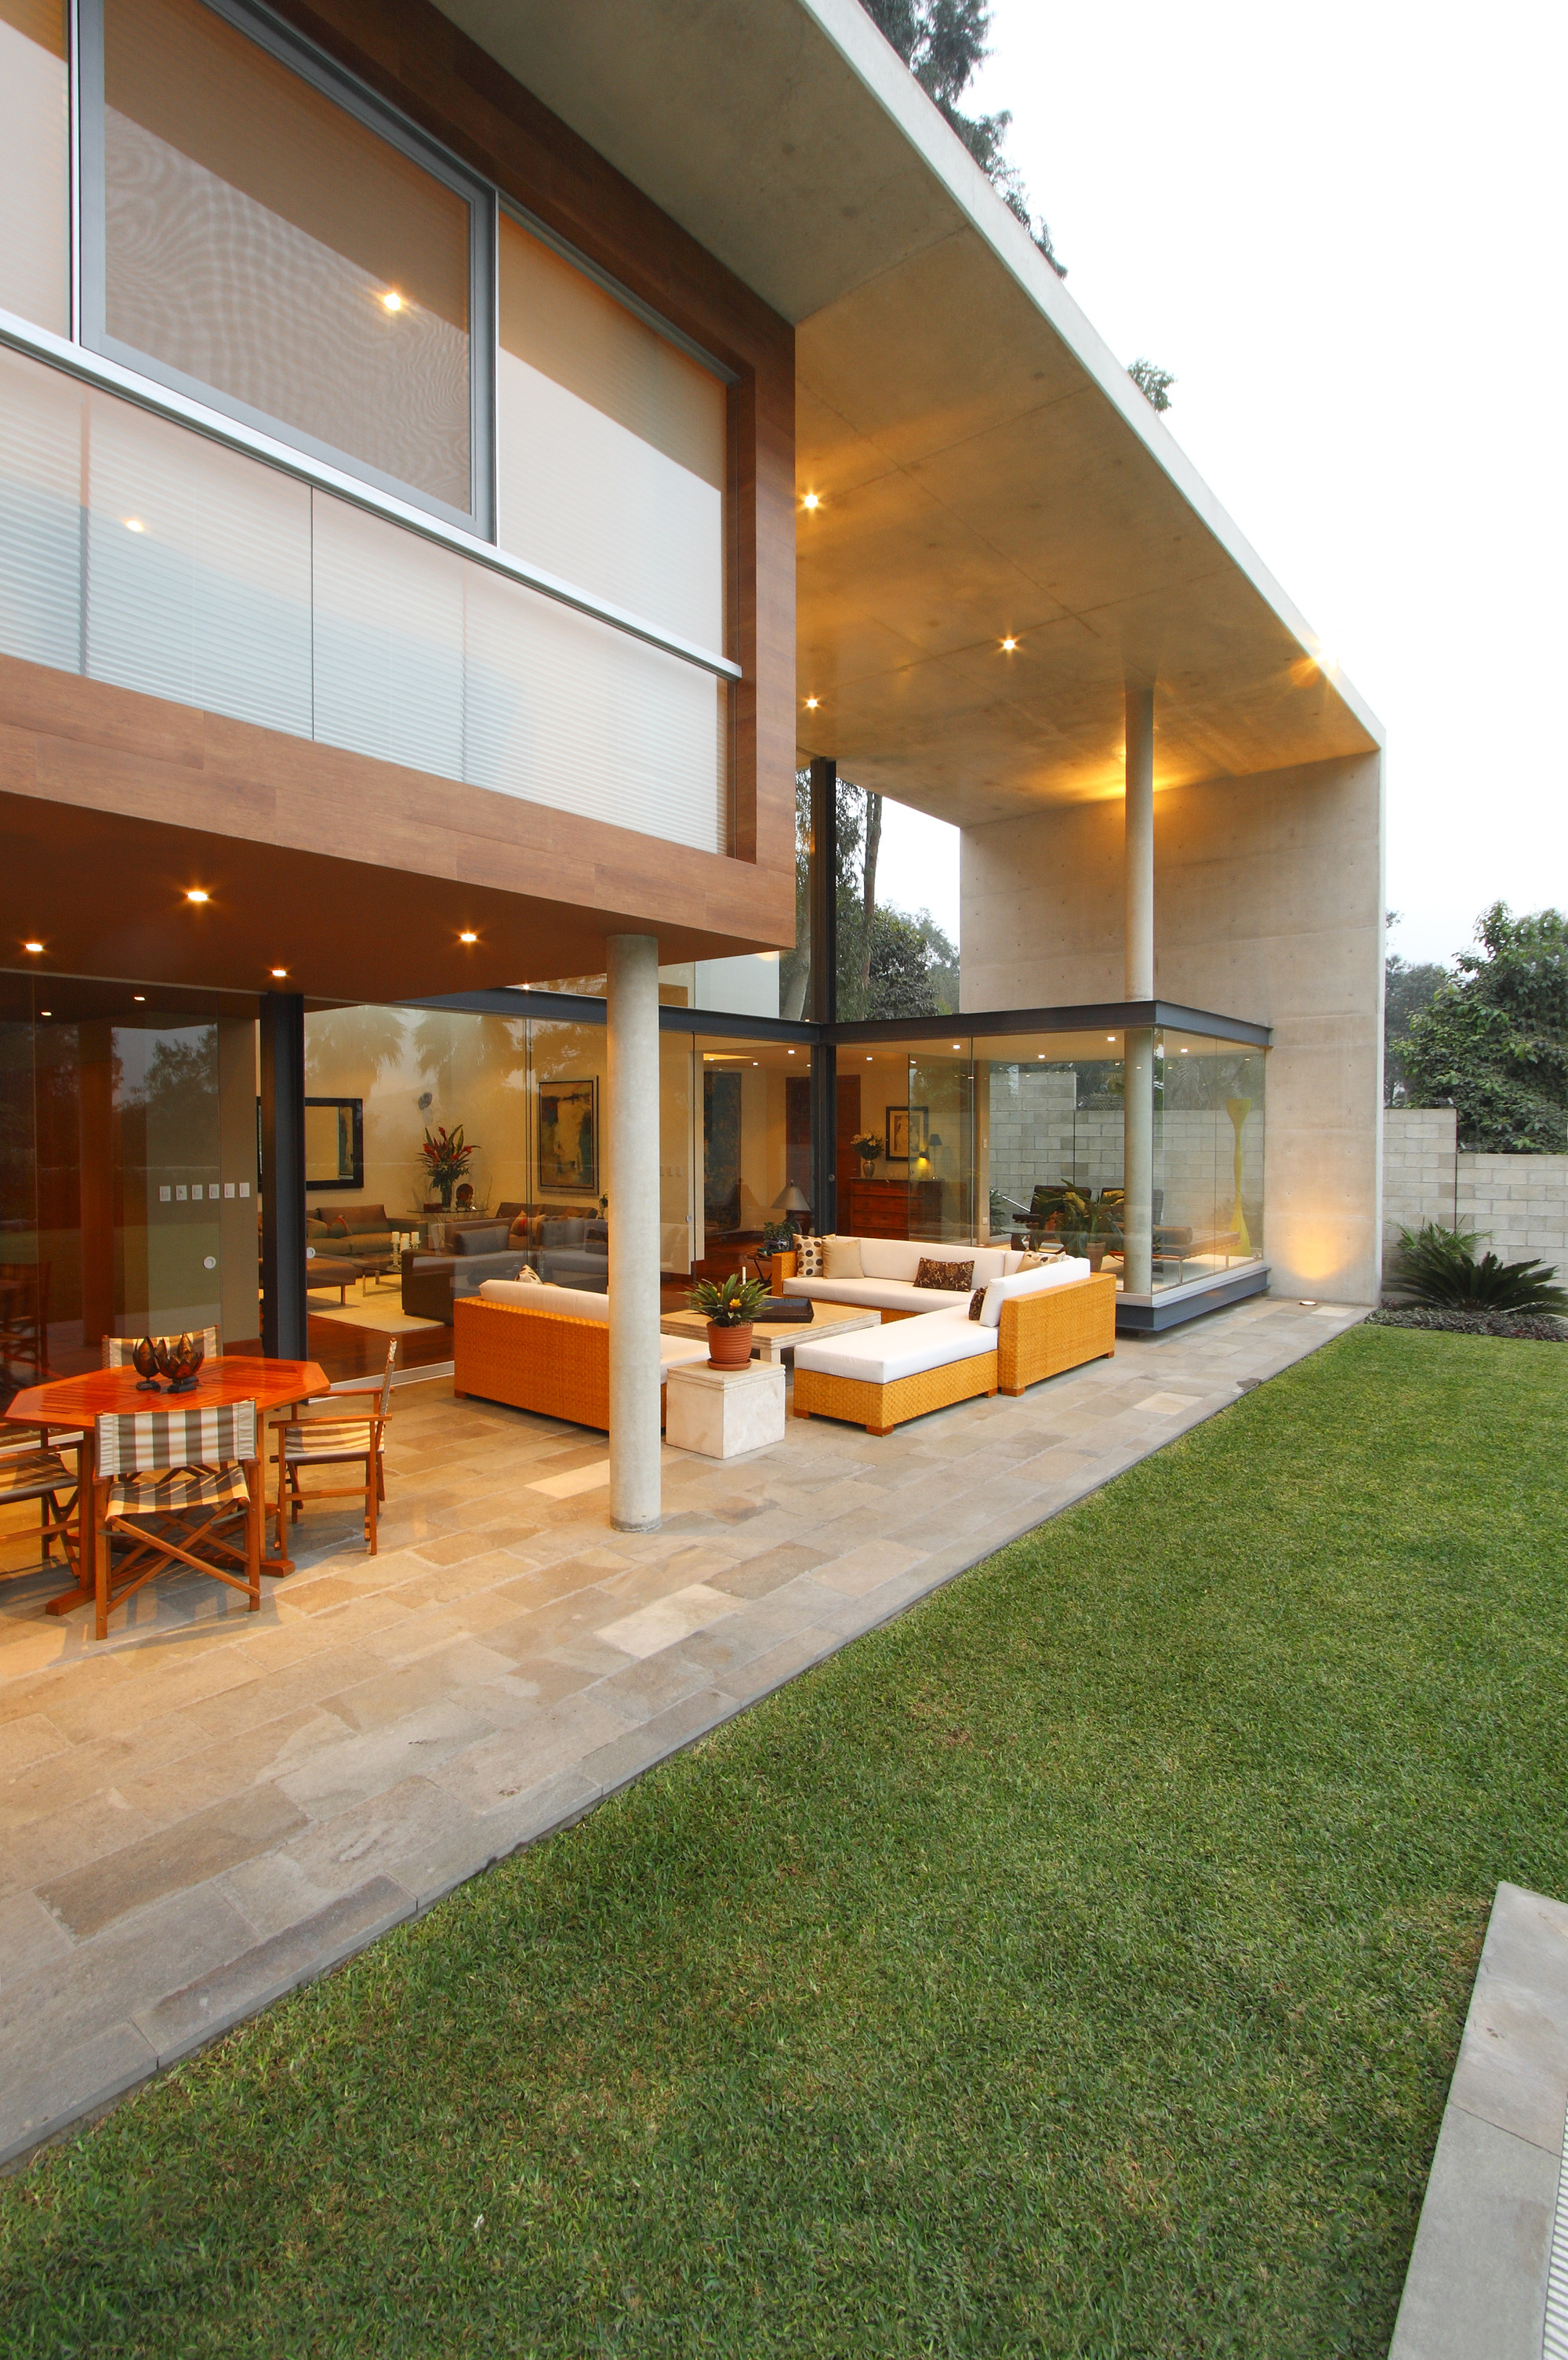 Galeria de casa s domenack arquitectos 4 for Arquitectos para casas